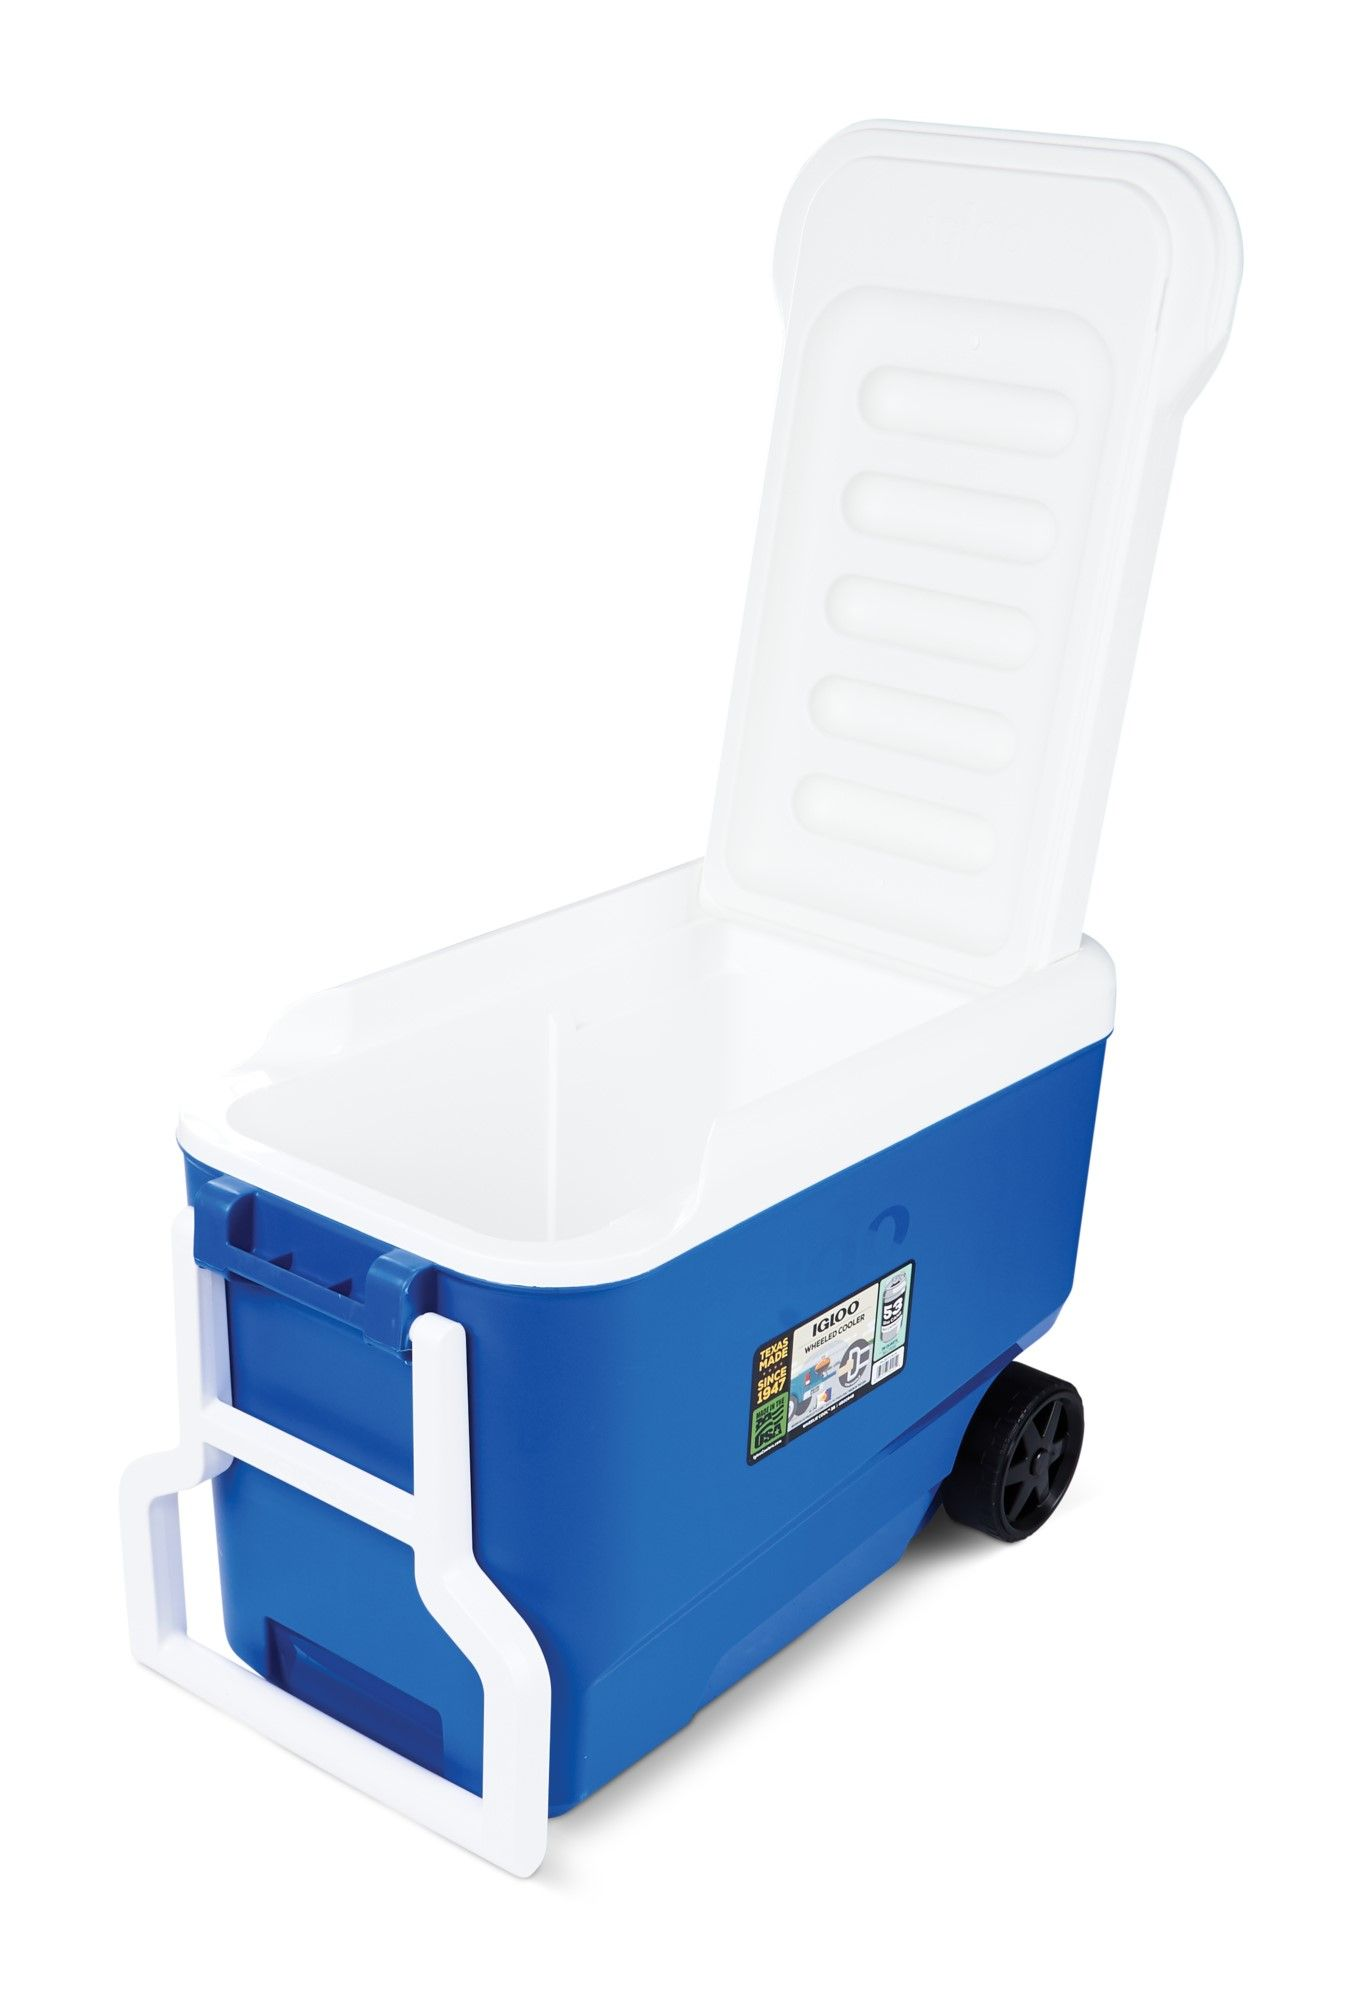 Wheelie Cool 2020-2